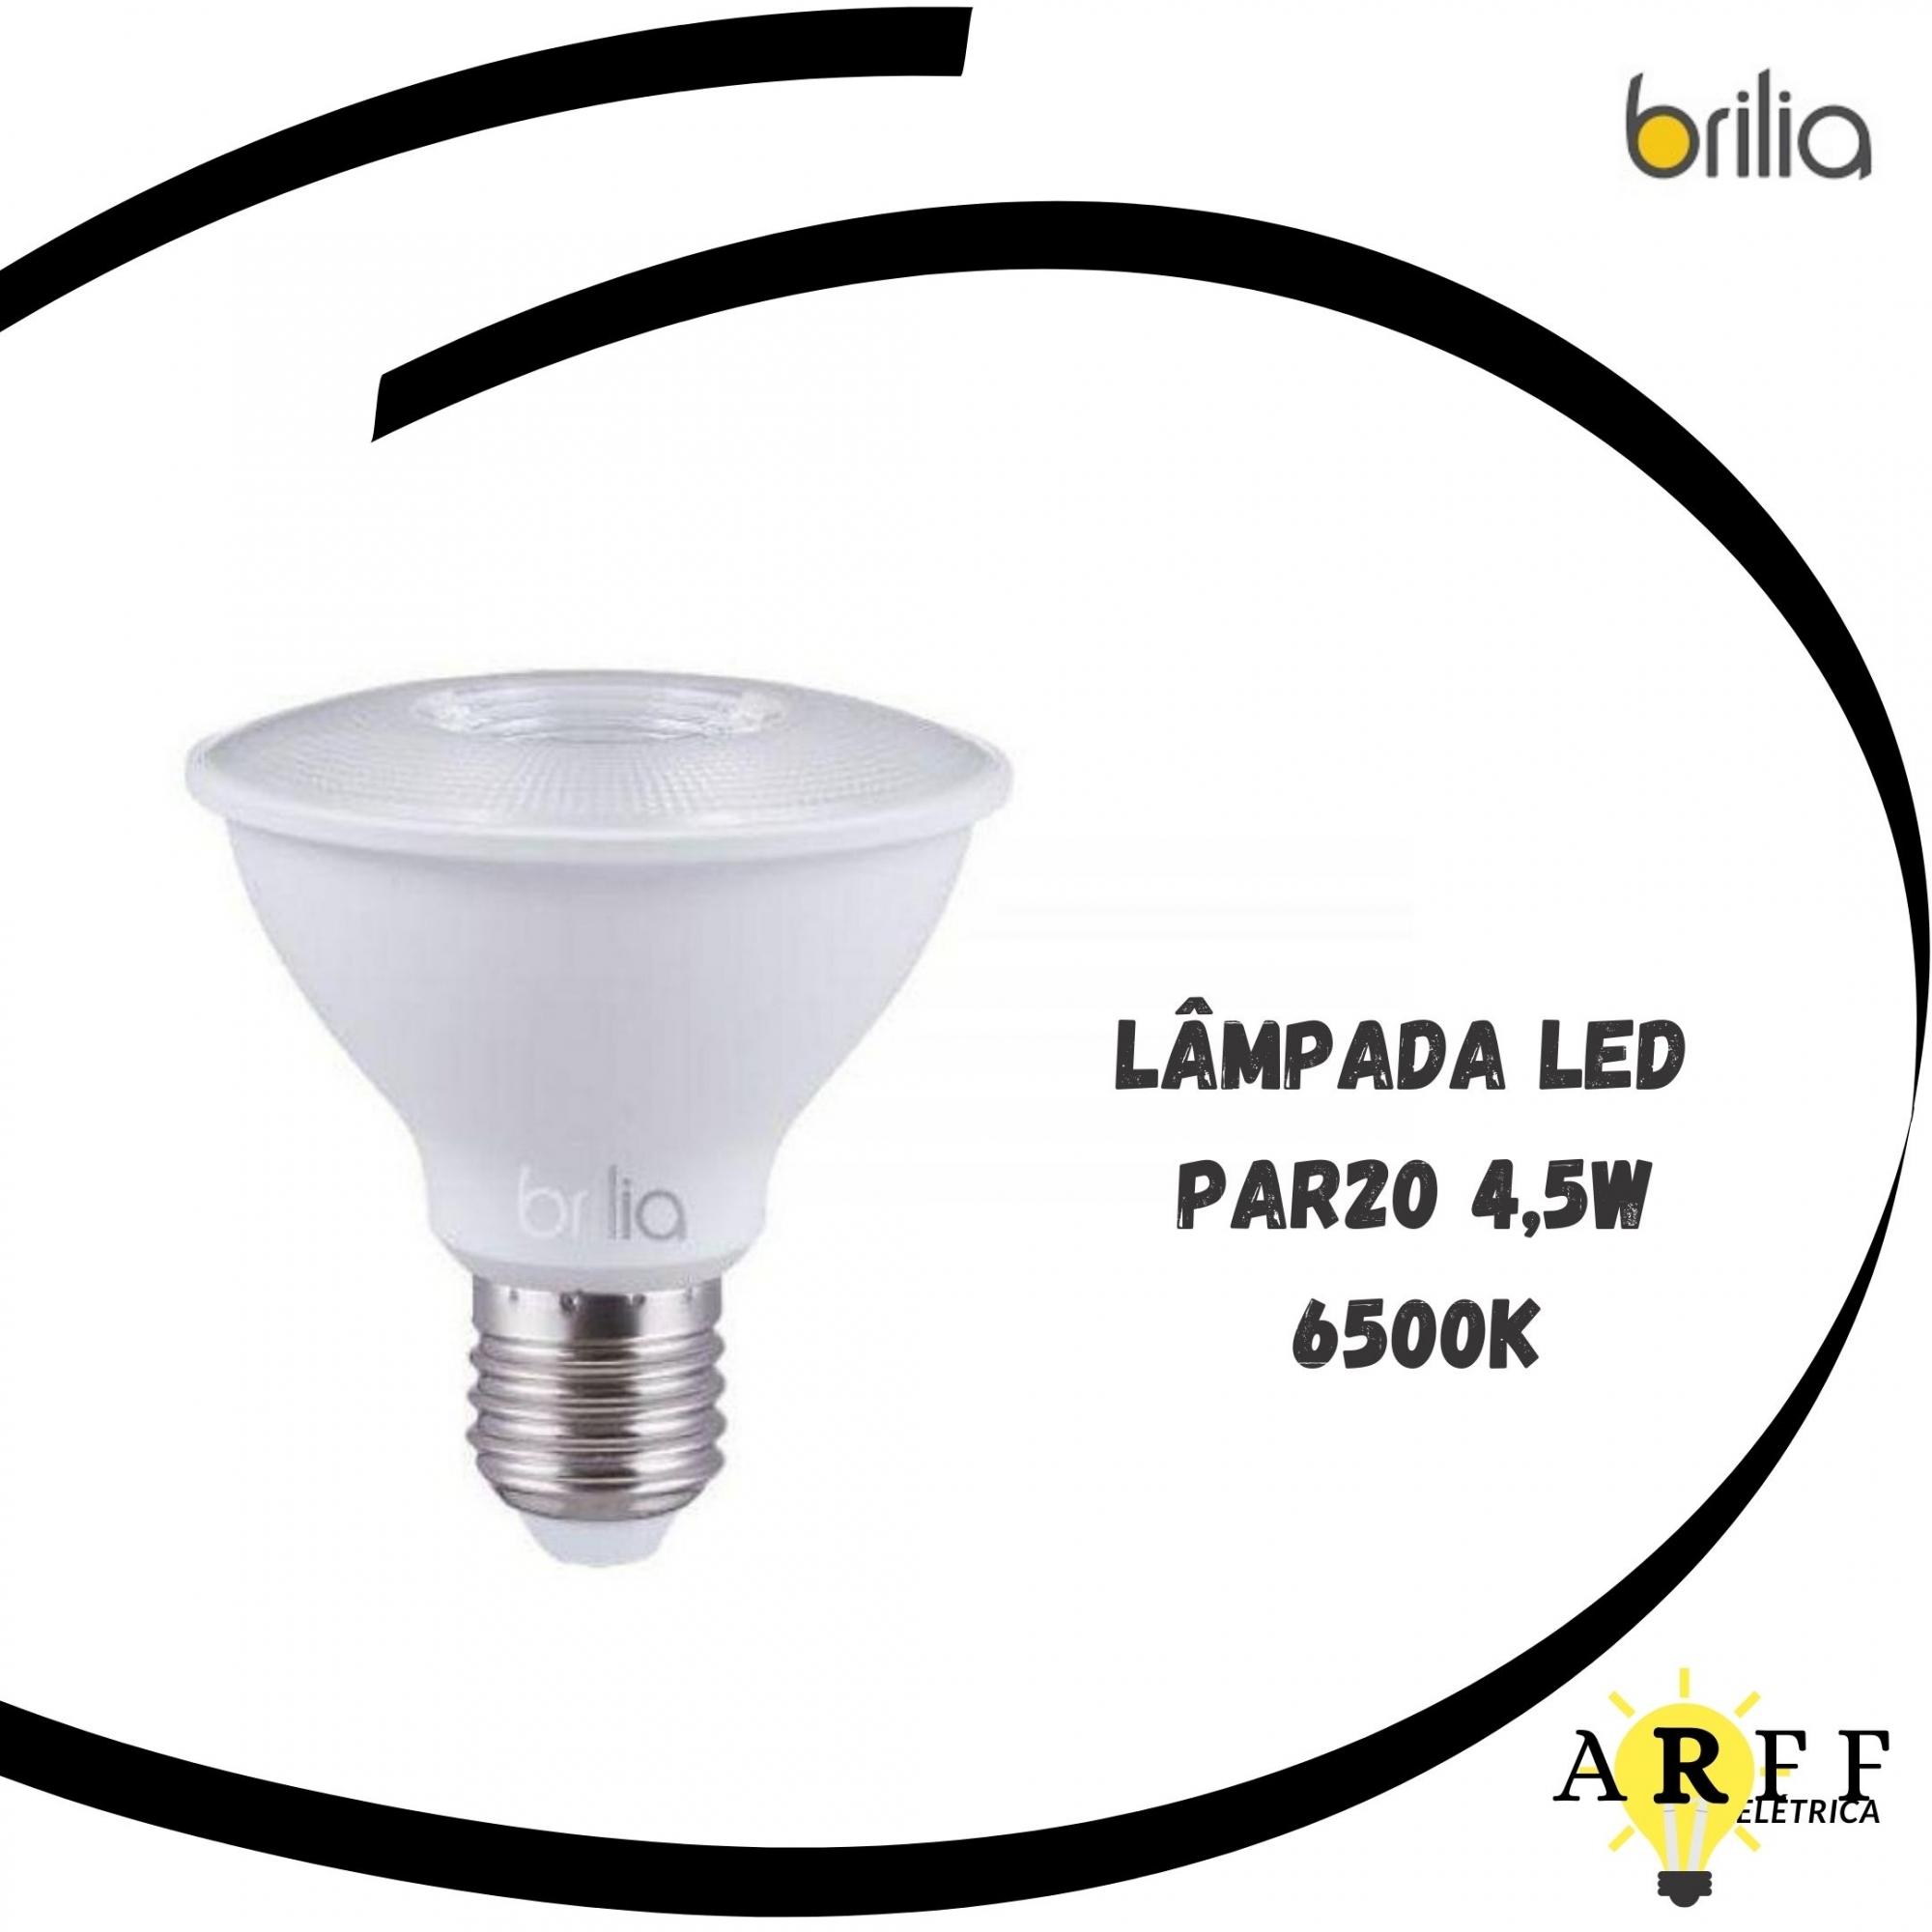 Lampada Led PAR20 4,5W 6500K Bivolt